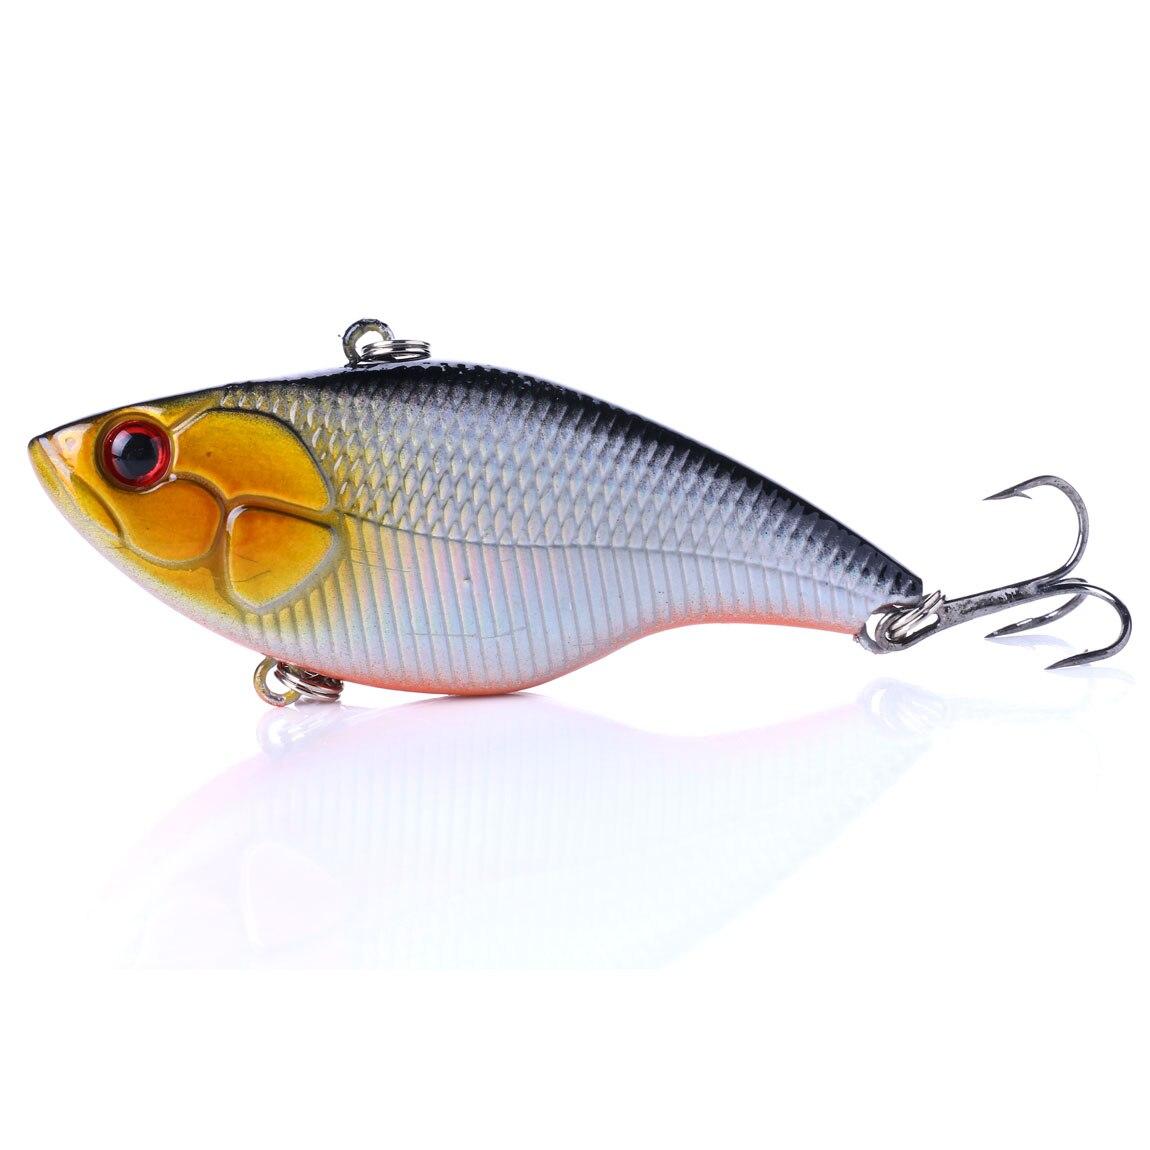 1pcs 7.5cm 18g Hard Fishing Lure VIB Rattlin Hook Fishing Sinking Vib Rattlin Lures